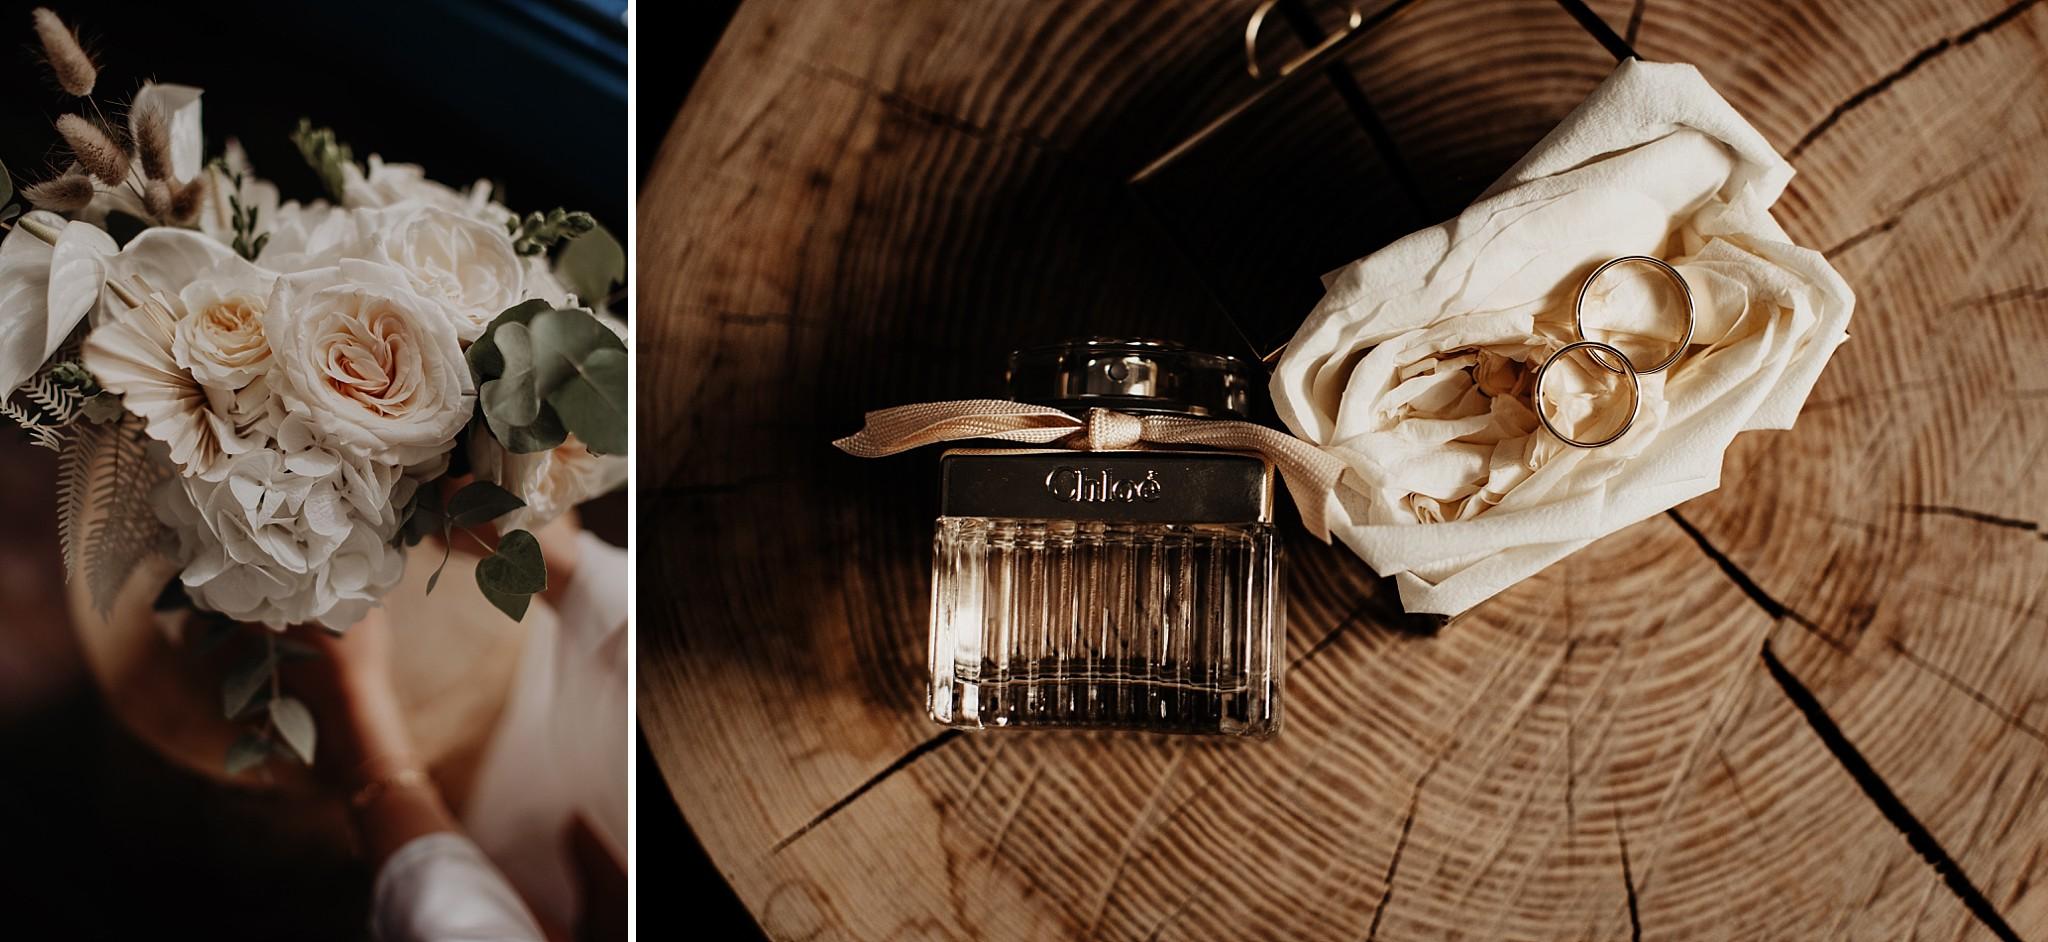 fotograf poznan wesele dobra truskawka piekne wesele pod poznaniem wesele w dobrej truskawce piekna para mloda slub marzen slub koronawirus slub listopad wesele koronawirus 016